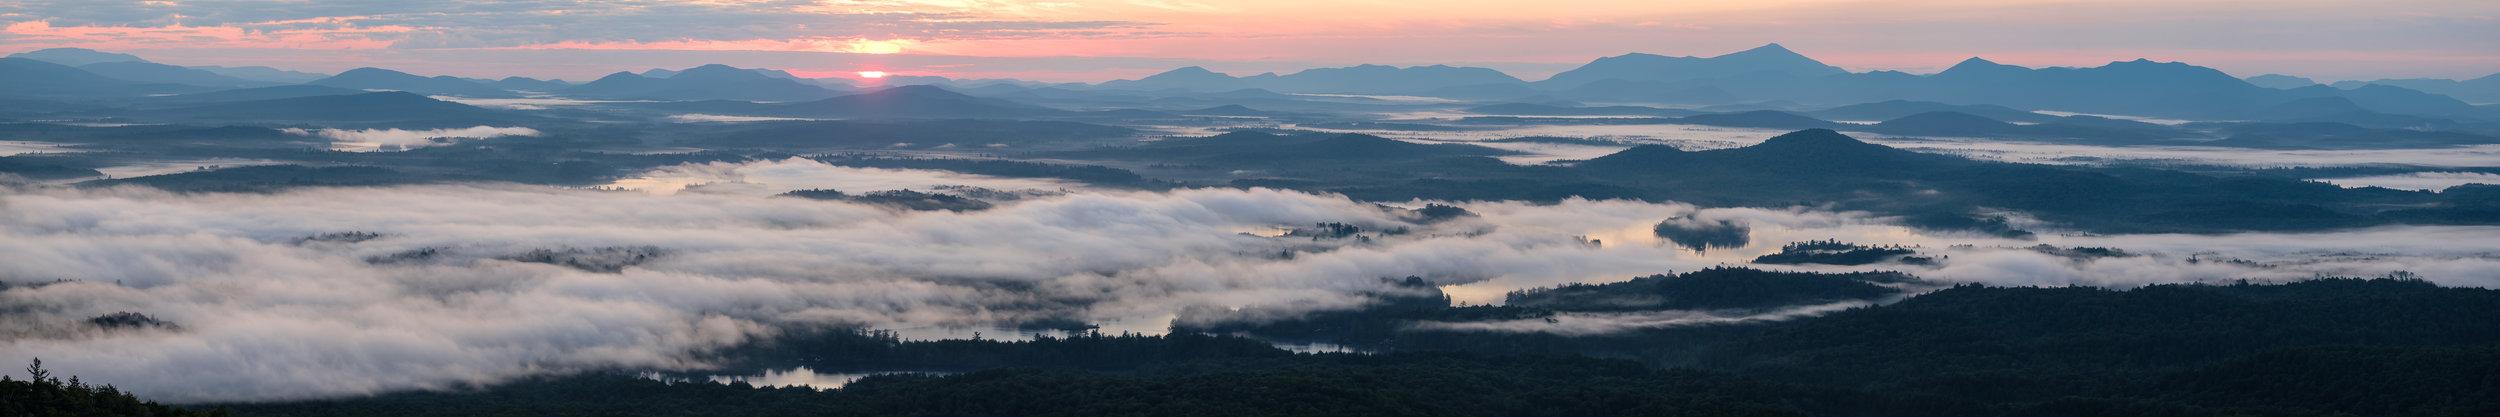 Sunrise from the Saint Regis Mountain firetower.